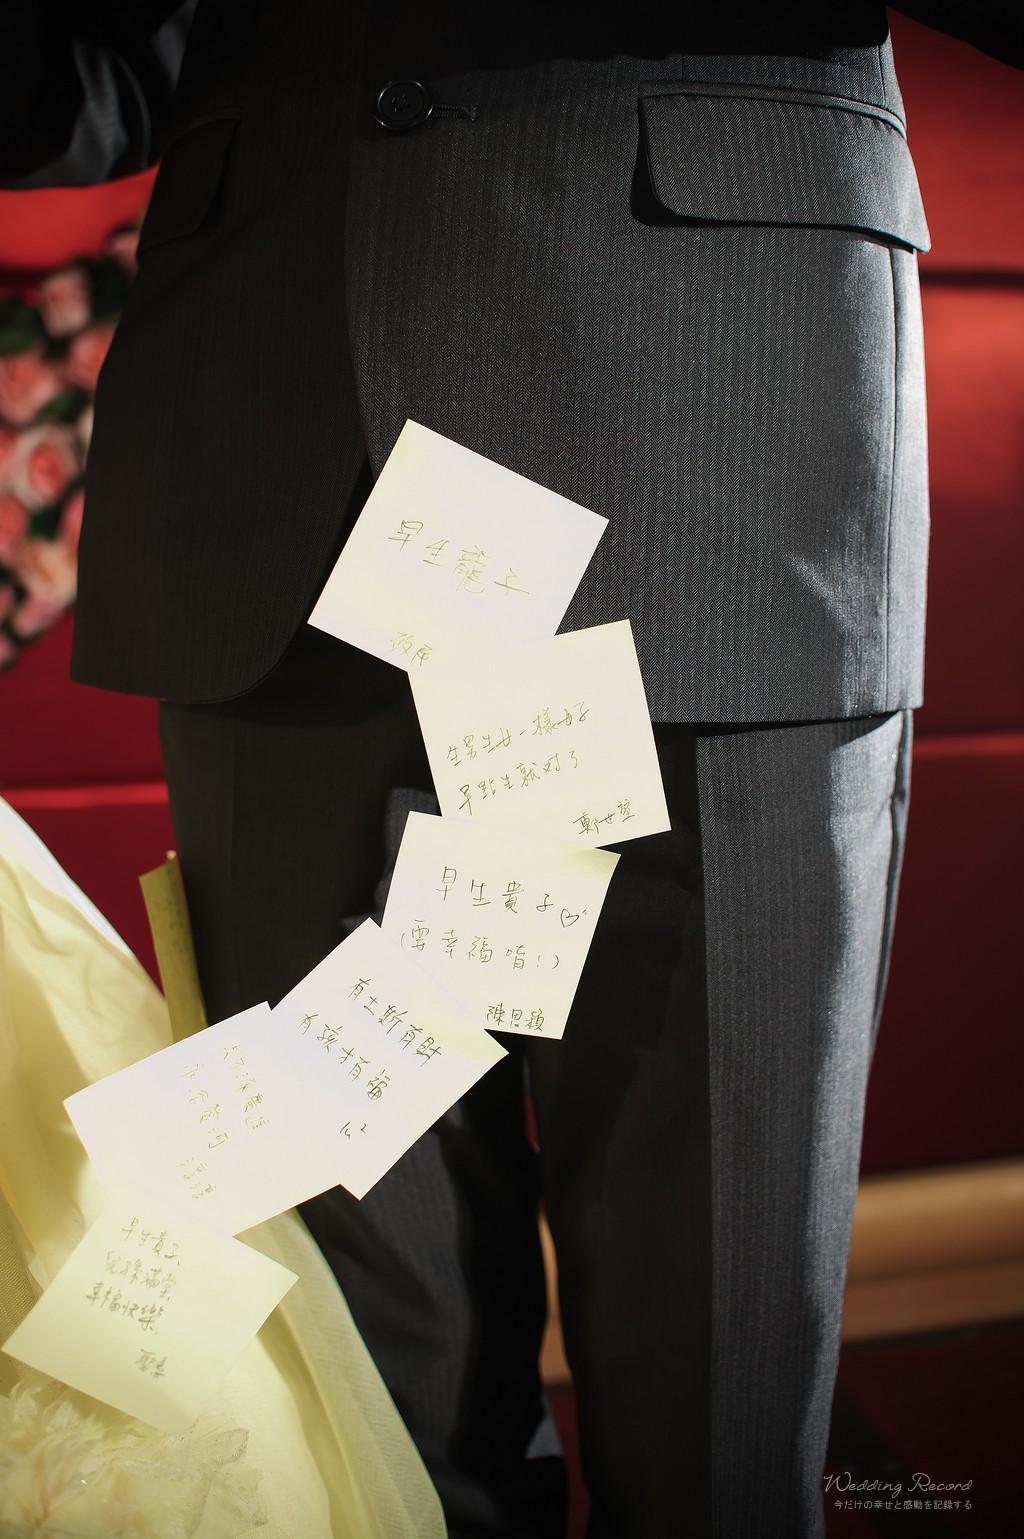 6934175750_1461b305ec_o-法豆影像工作室_婚攝, 婚禮攝影, 婚禮紀錄, 婚紗攝影, 自助婚紗, 婚攝推薦, 攝影棚出租, 攝影棚租借, 孕婦禮服出租, 孕婦禮服租借, CEO專業形象照, 形像照, 型像照, 型象照. 形象照團拍, 全家福, 全家福團拍, 招團, 揪團拍, 親子寫真, 家庭寫真, 抓周, 抓周團拍